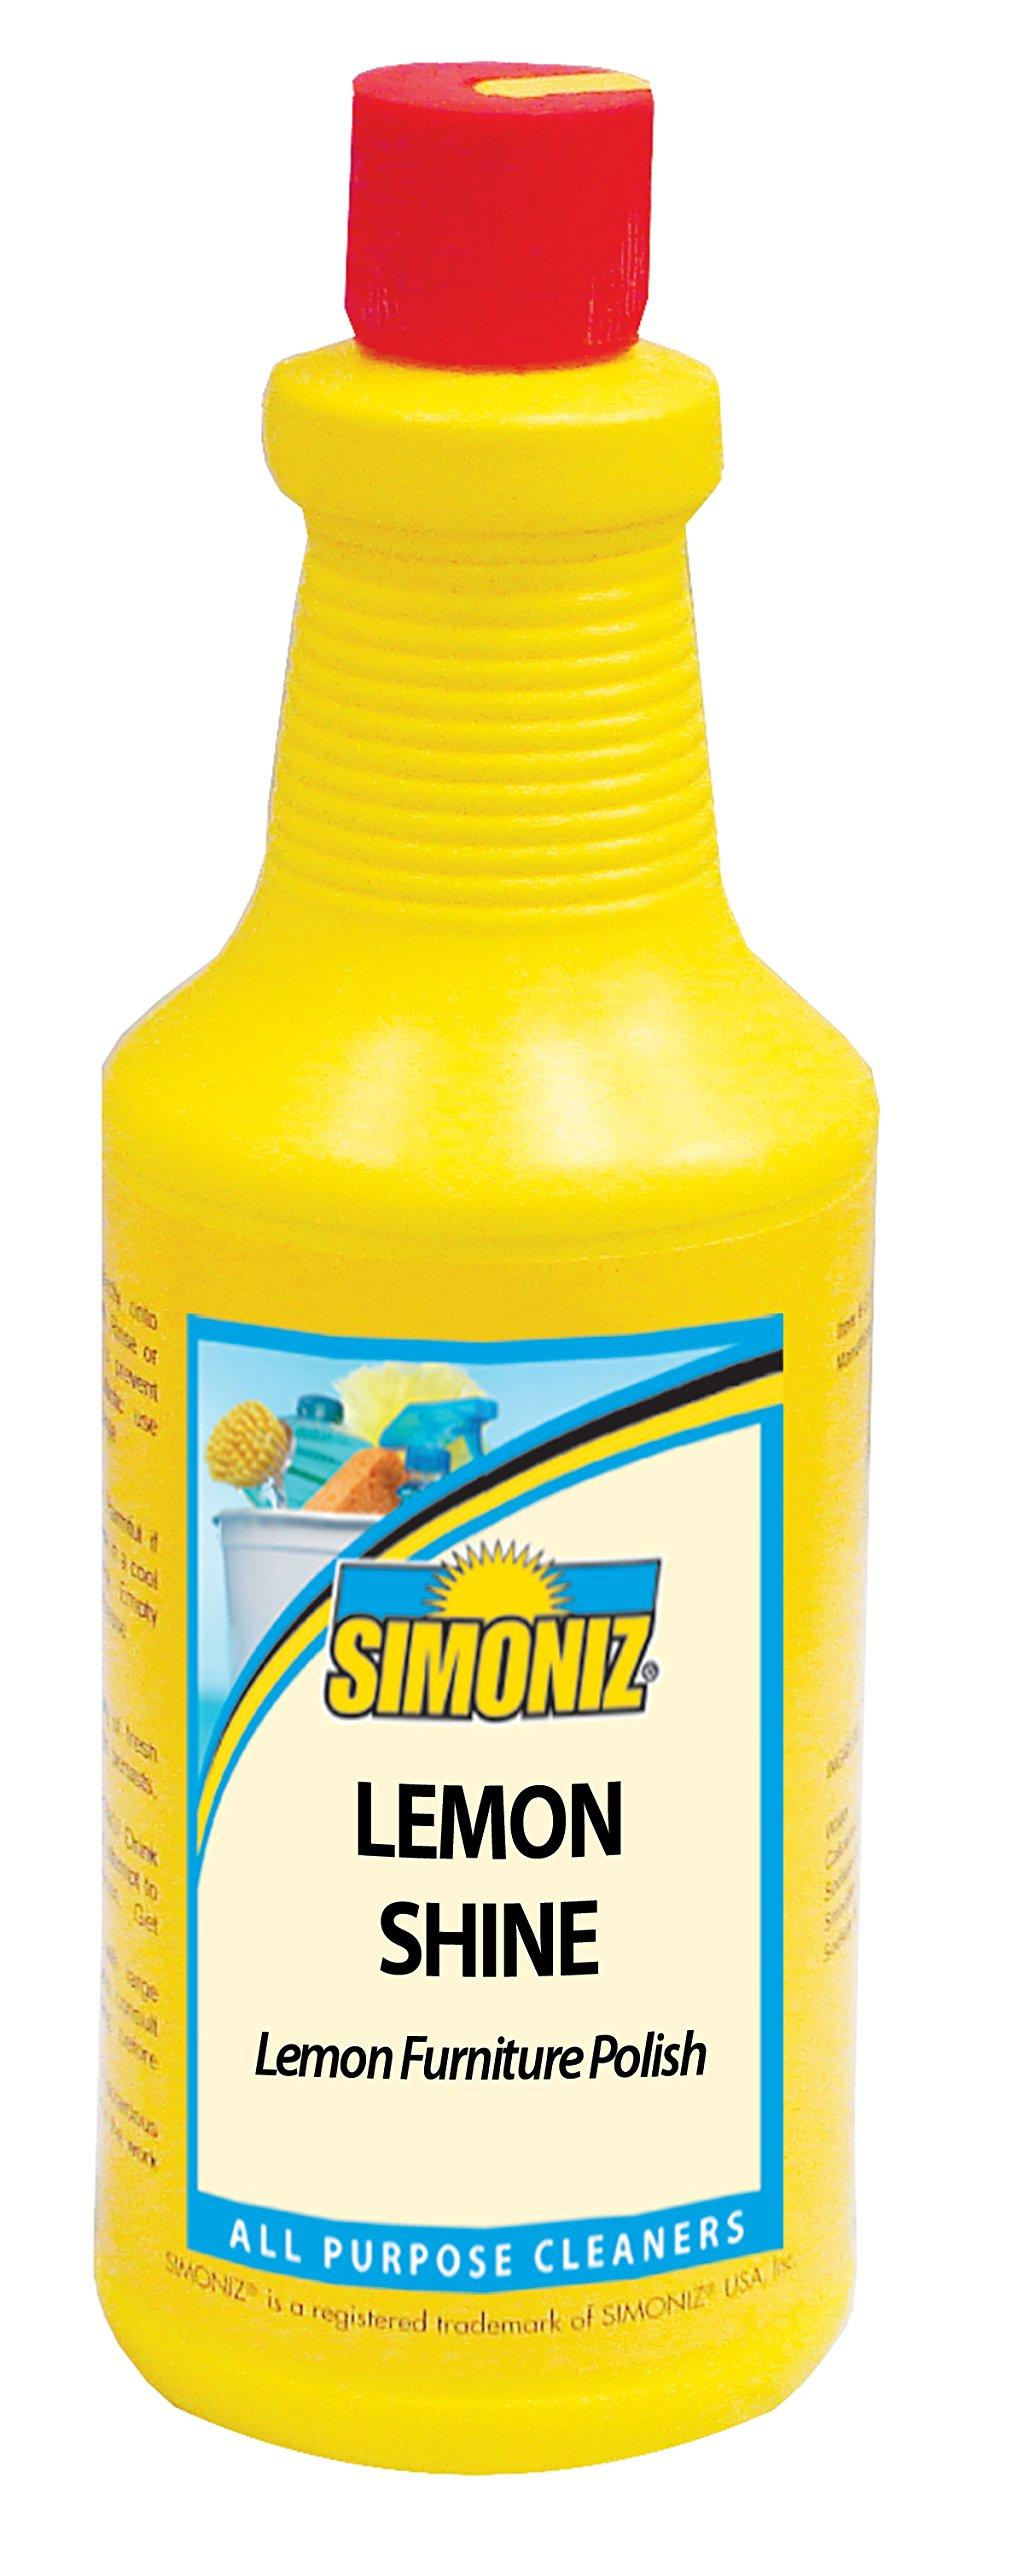 Simoniz L2045012 Lemon Shine Furniture Polish, 32 oz Bottles per Case (Pack of 12)